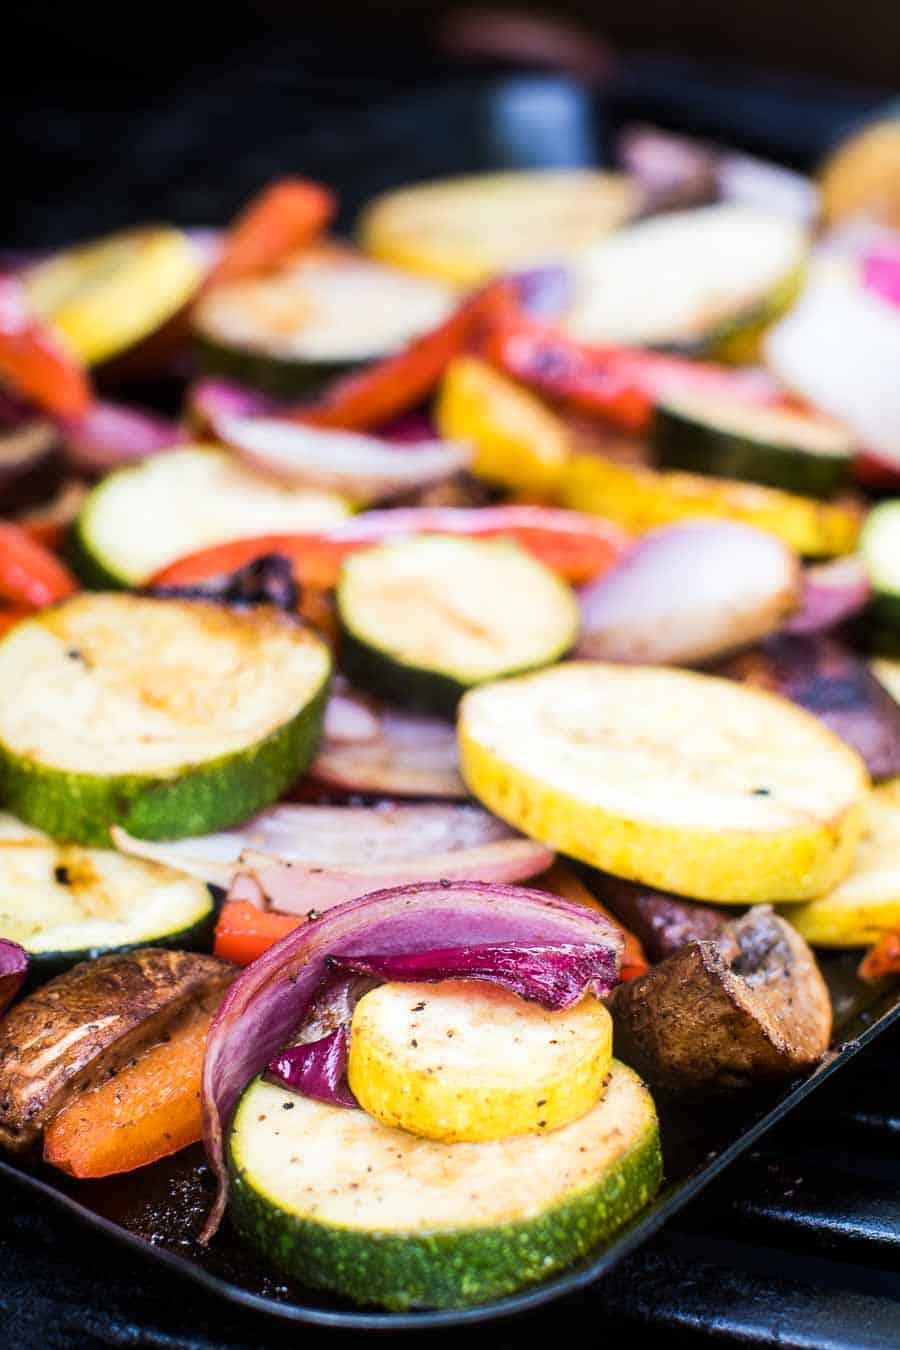 Best Grilled Vegetables on grill